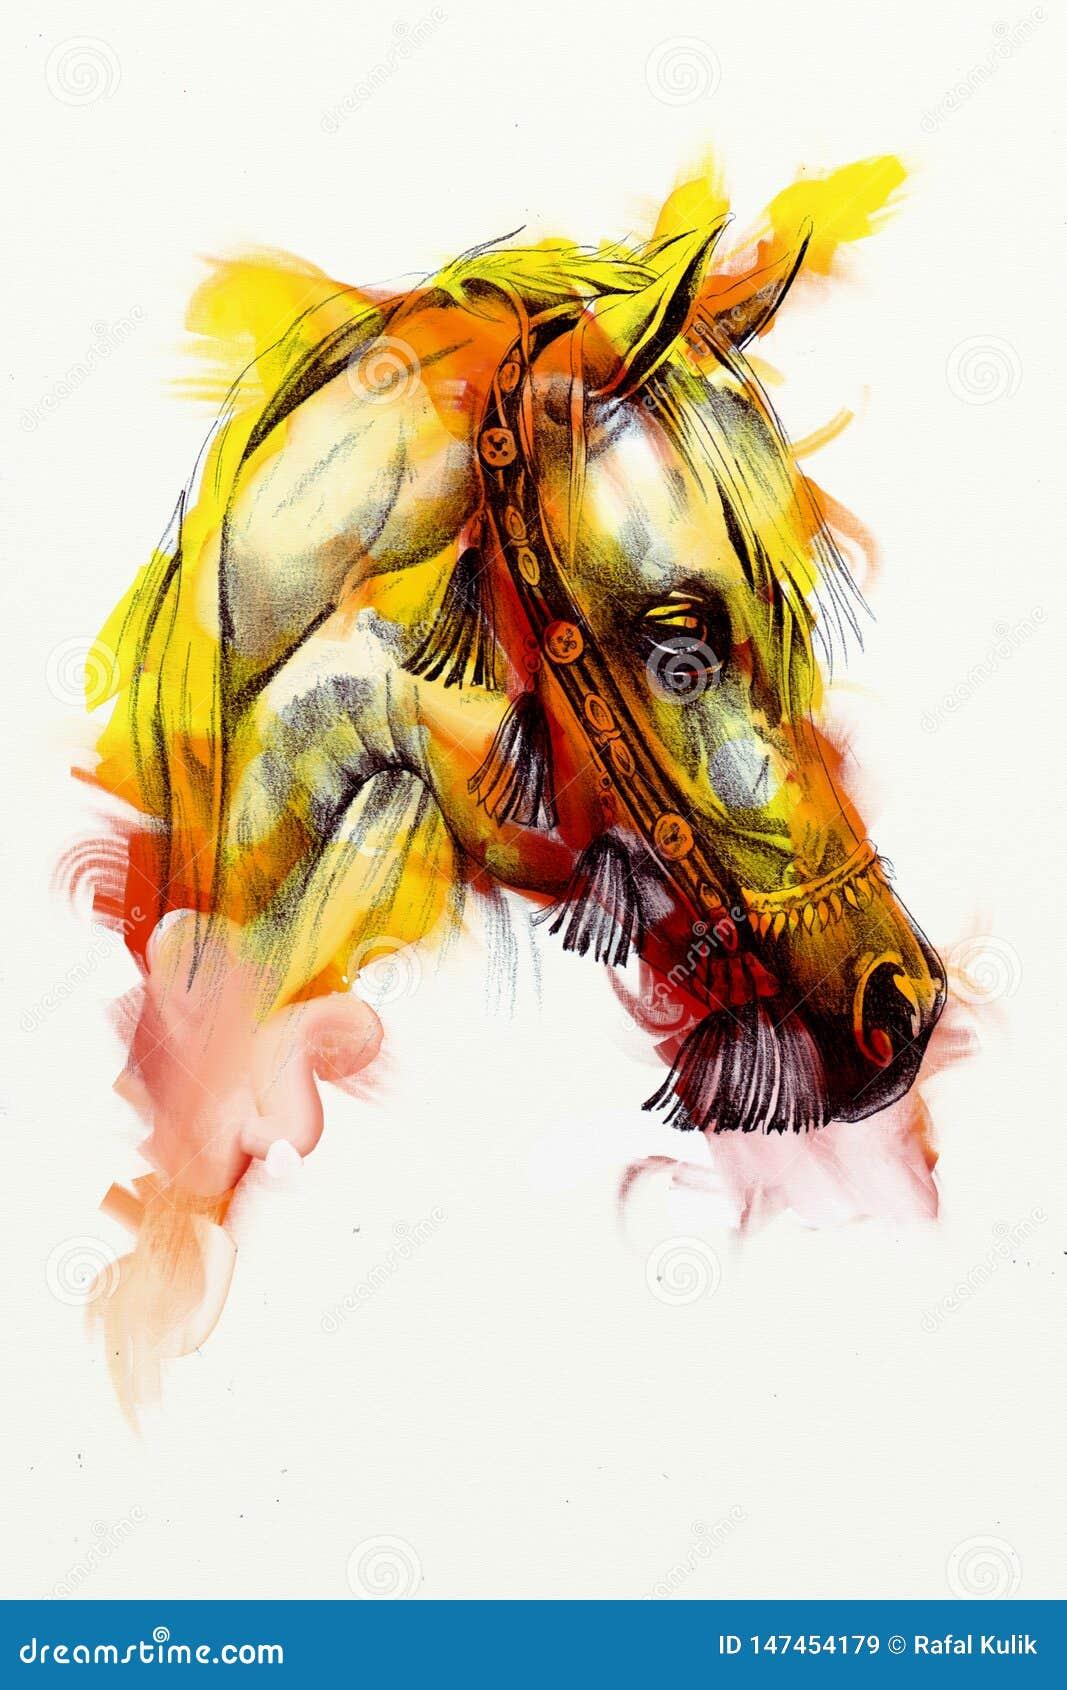 Original Oil Painting Of A Fine Arabian Horse Funny Artwork Stock Illustration Illustration Of Black Background 147454179